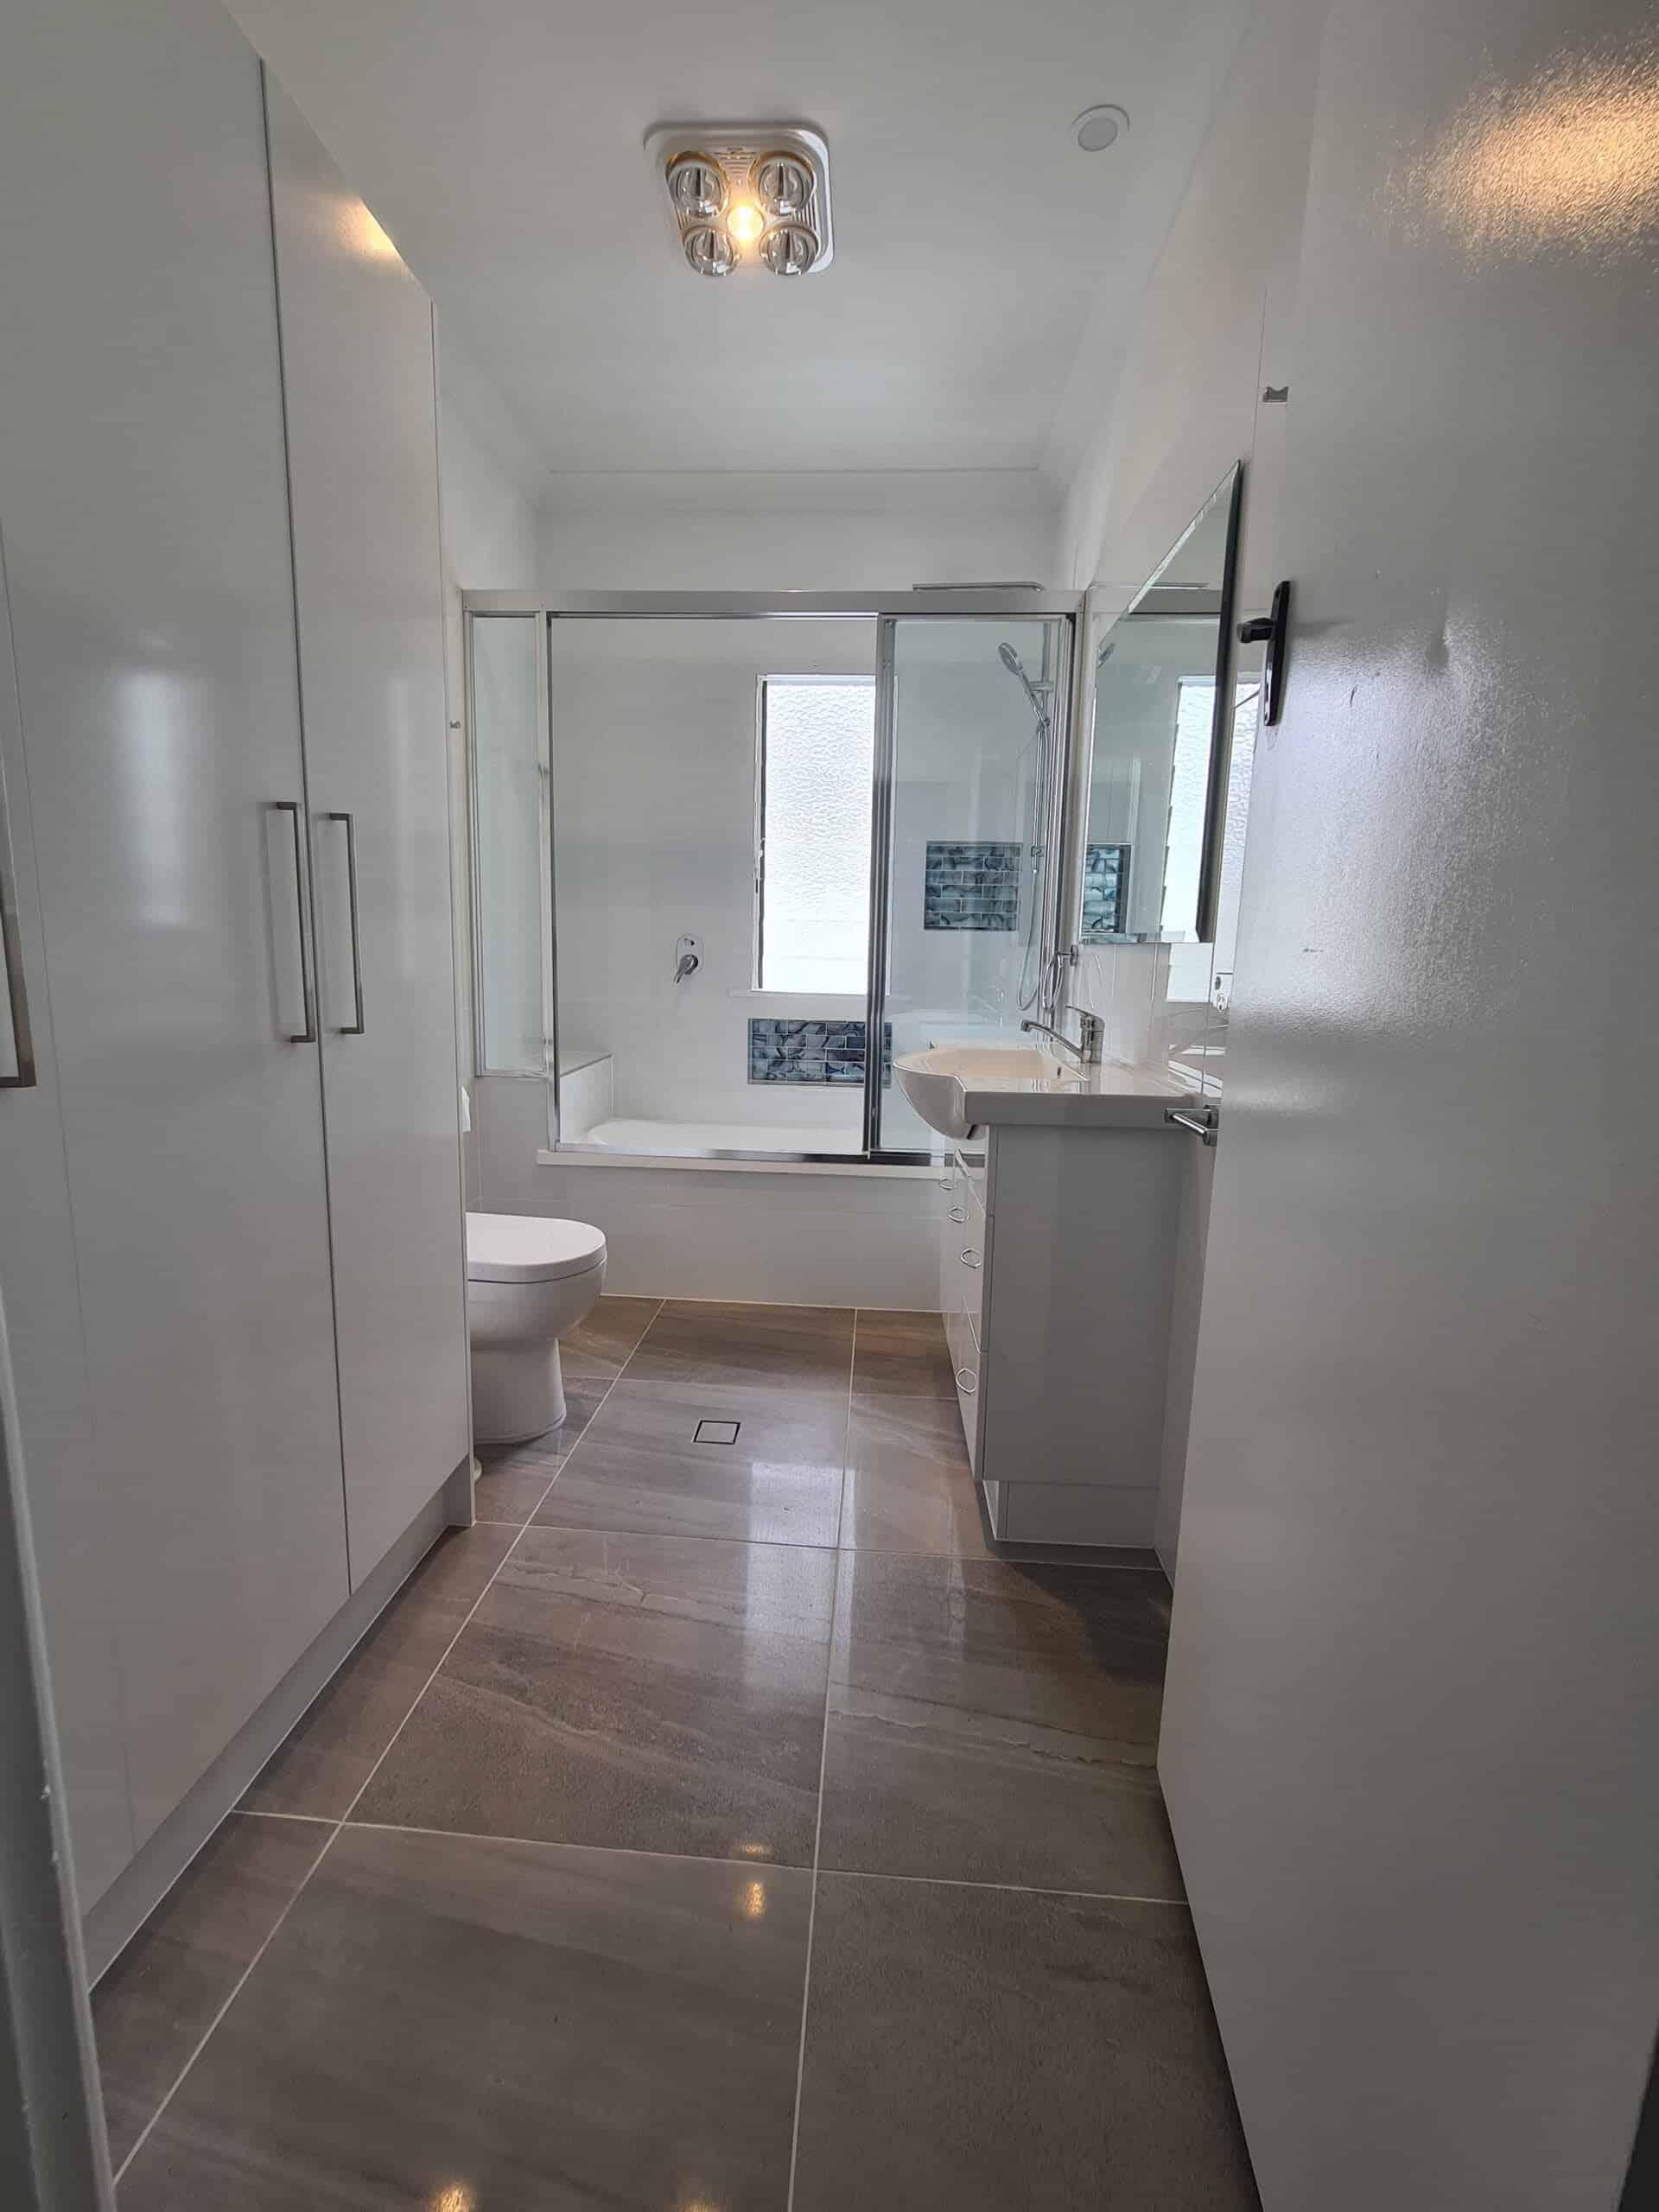 Stafford bathroom renovation